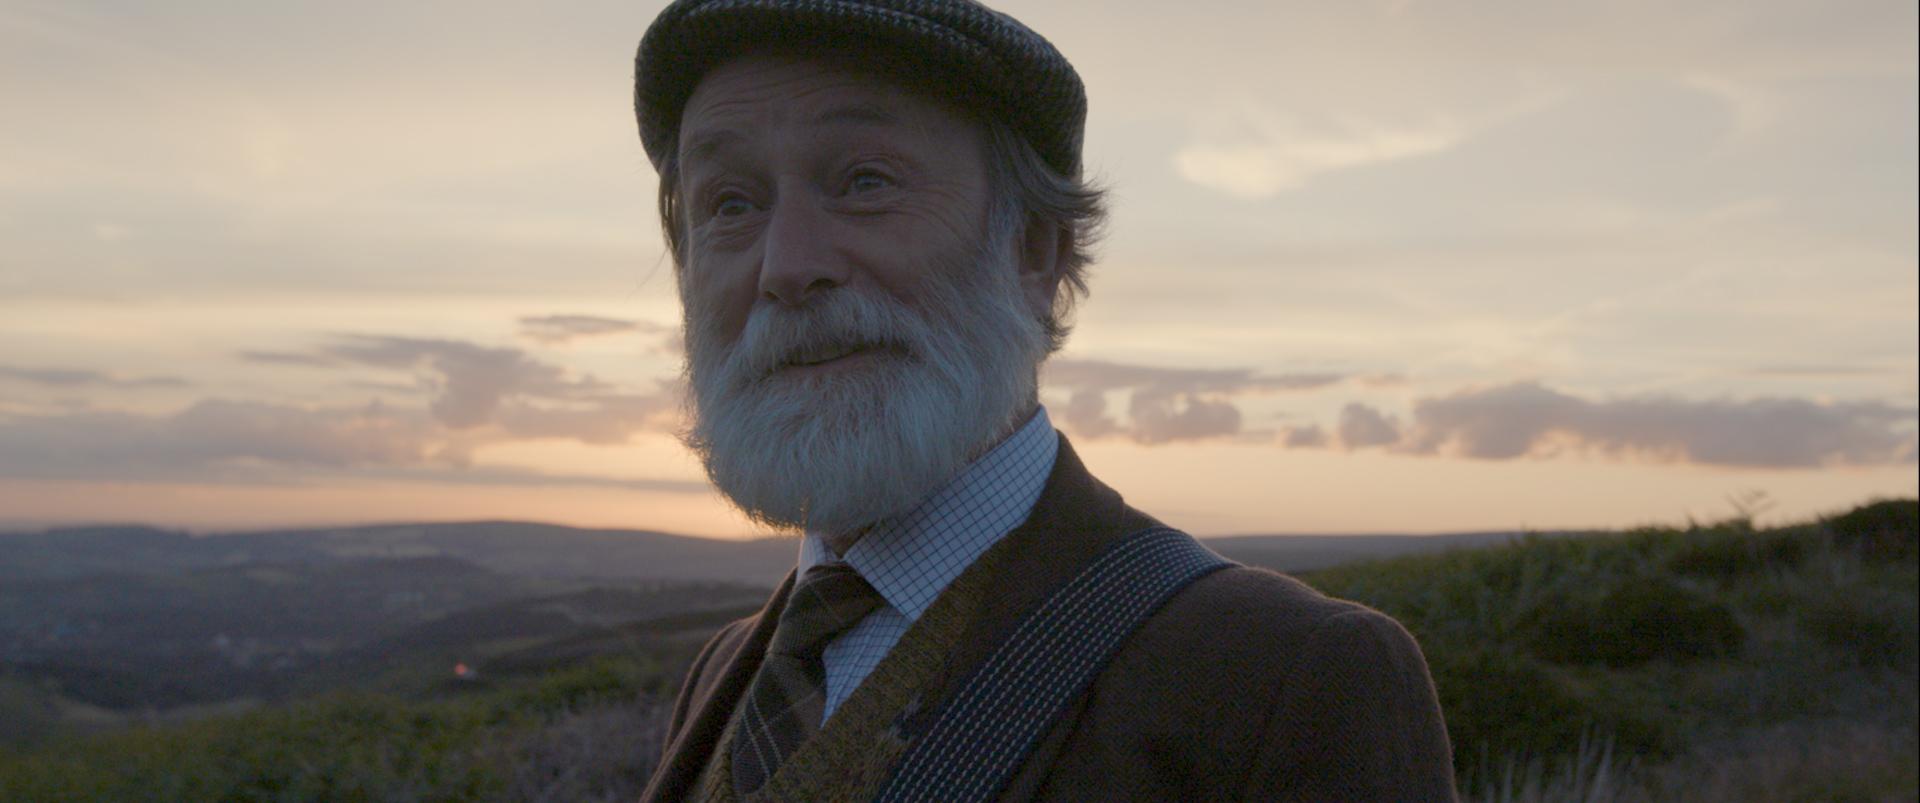 Melvyn Rawlinson as 'the carbon farmer'